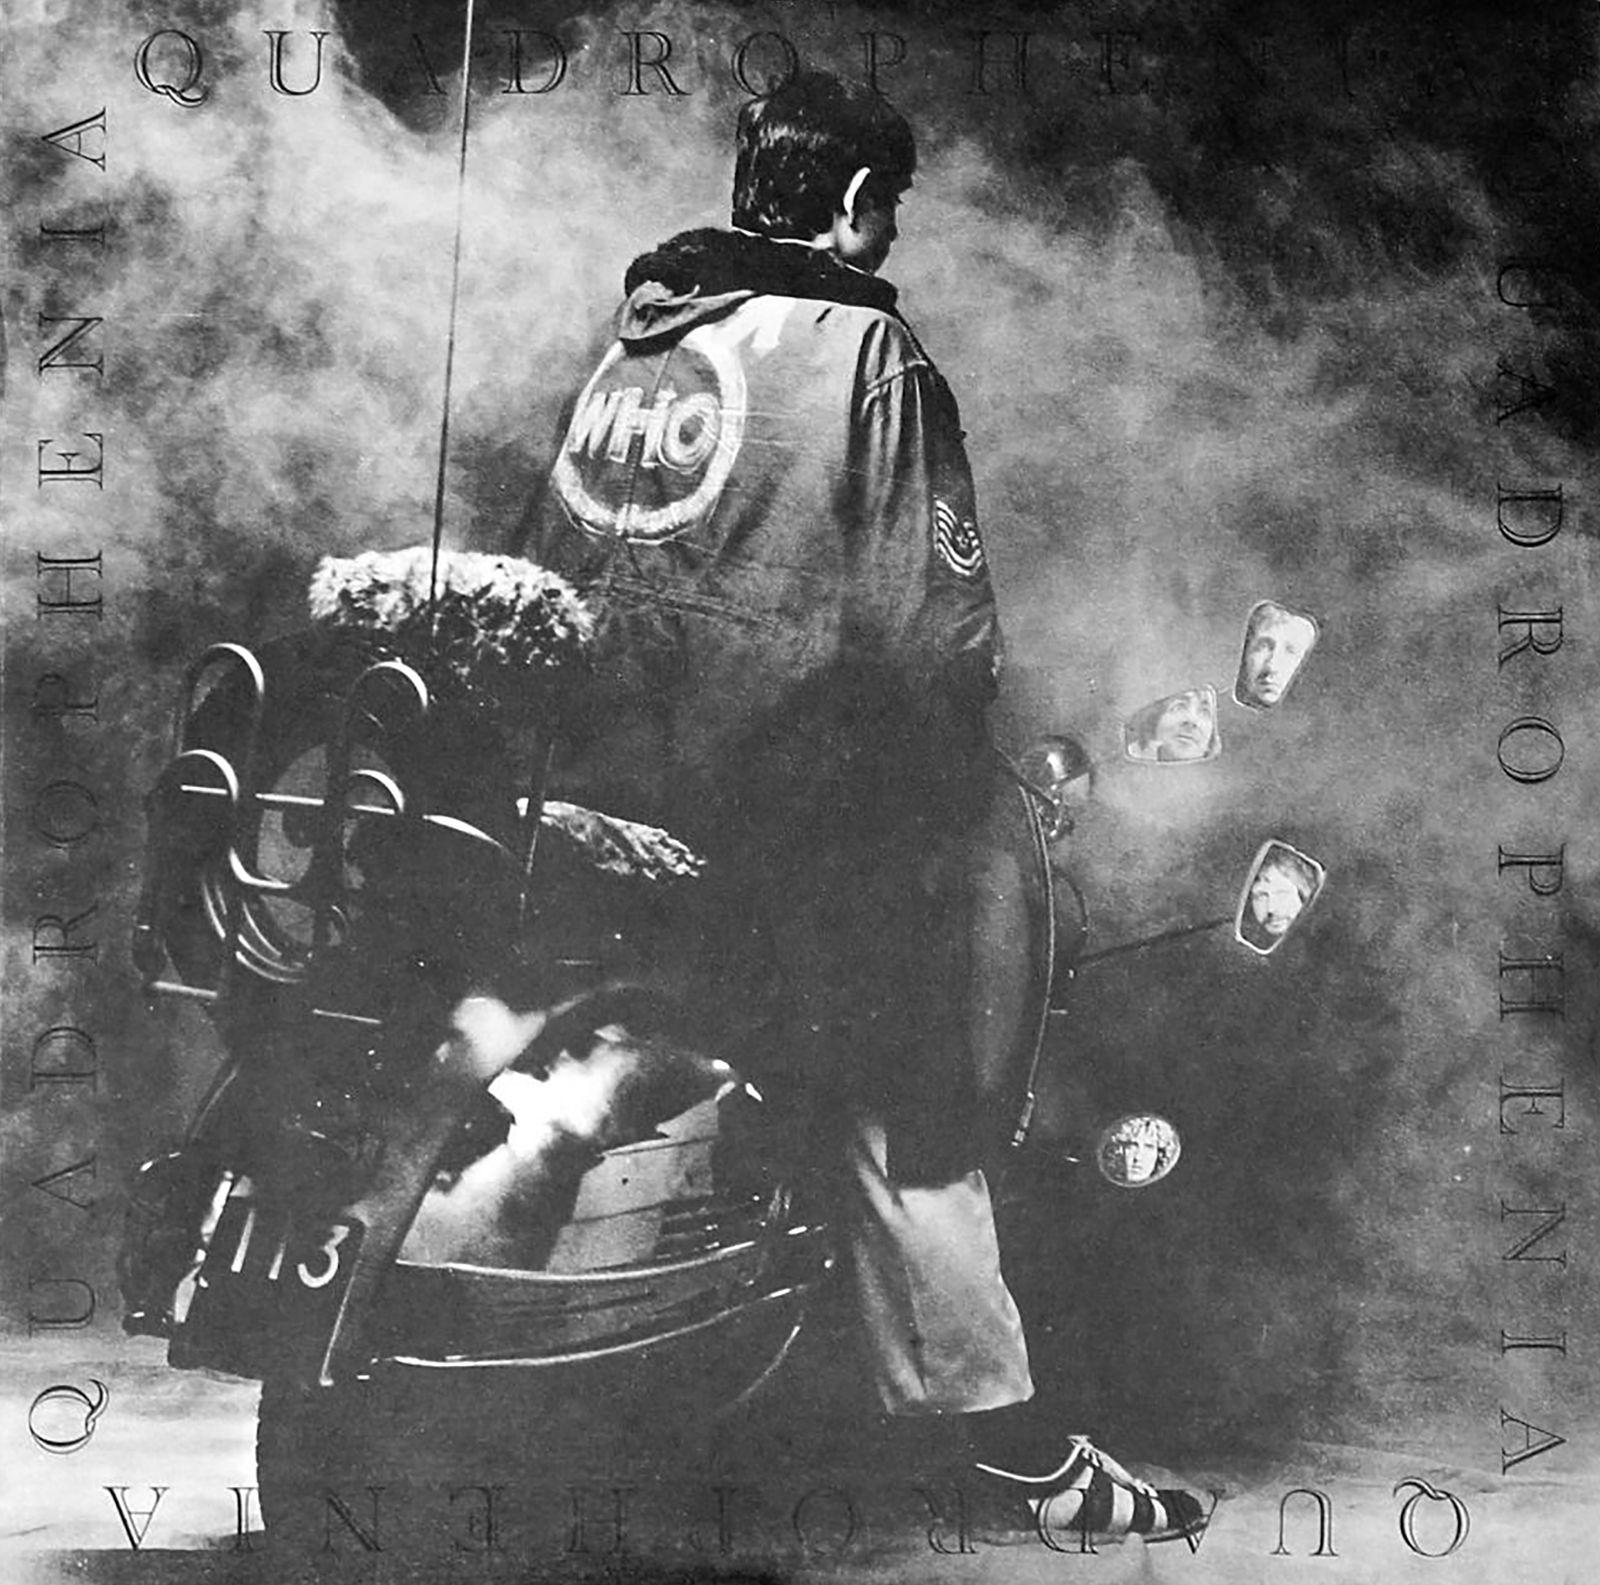 Pete Townshend - Quadrophenia Cover